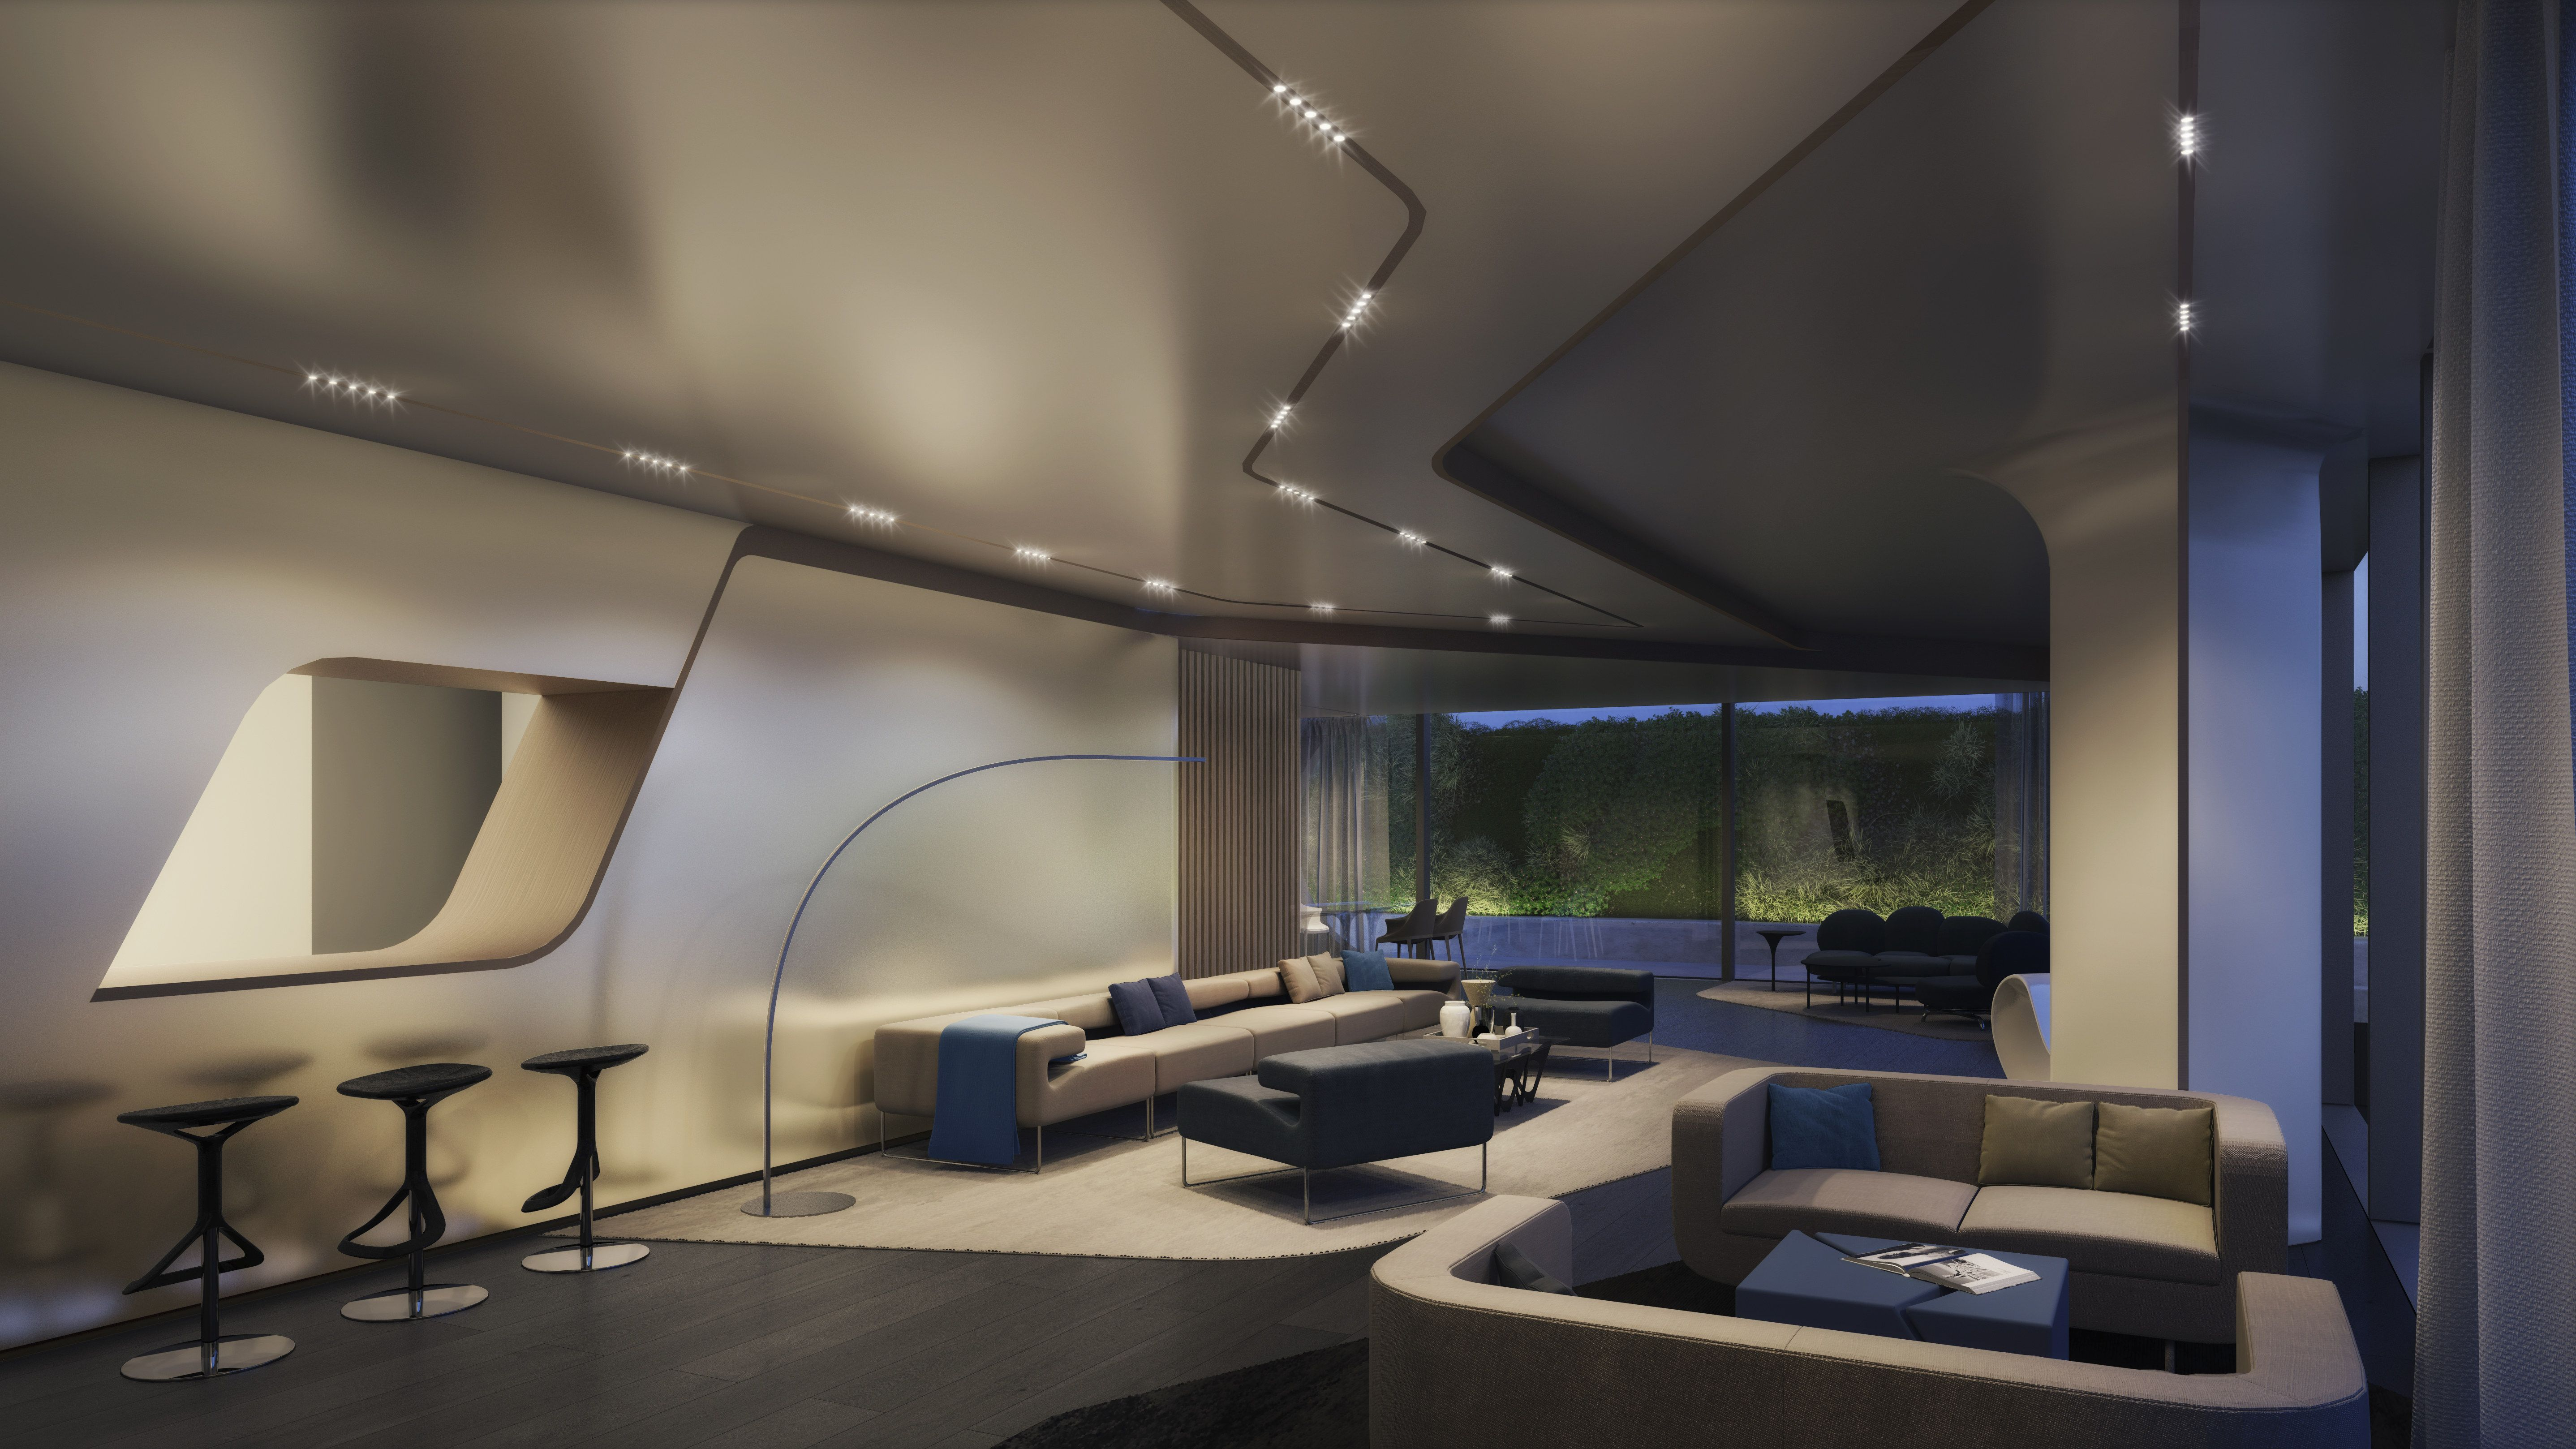 Tour Nyc S First Zaha Hadid Designed Apartments Zaha Hadid